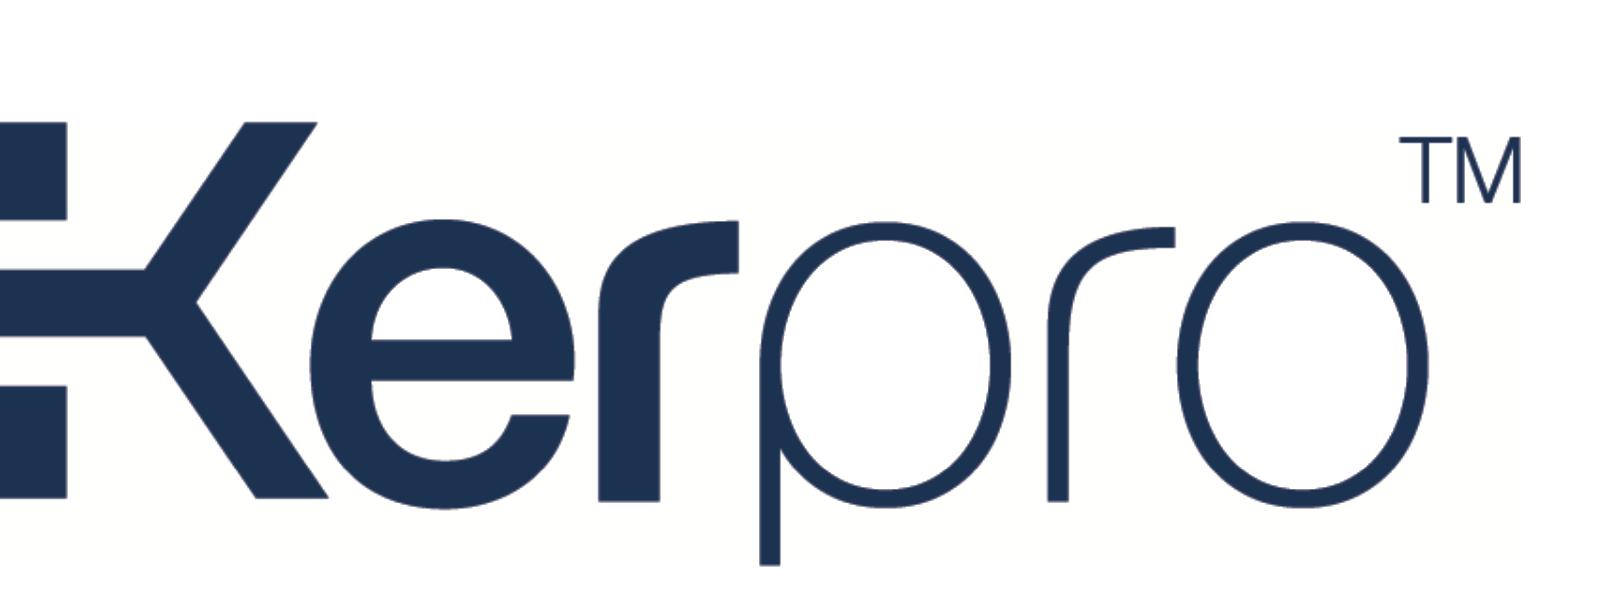 Logo Kerpro